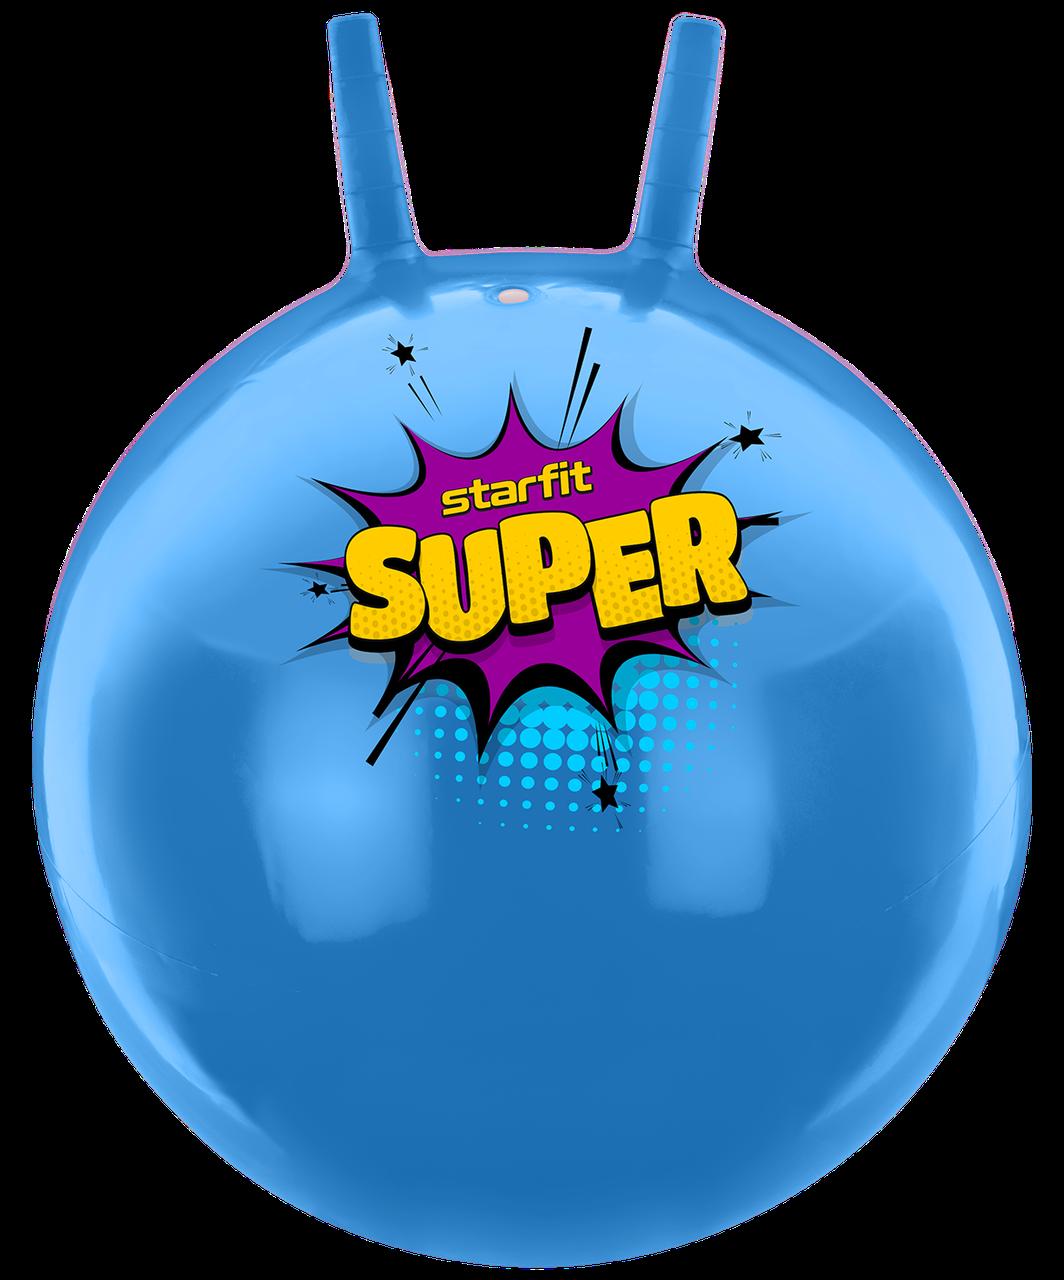 Мяч-попрыгун GB-0401 45 см, Starfit